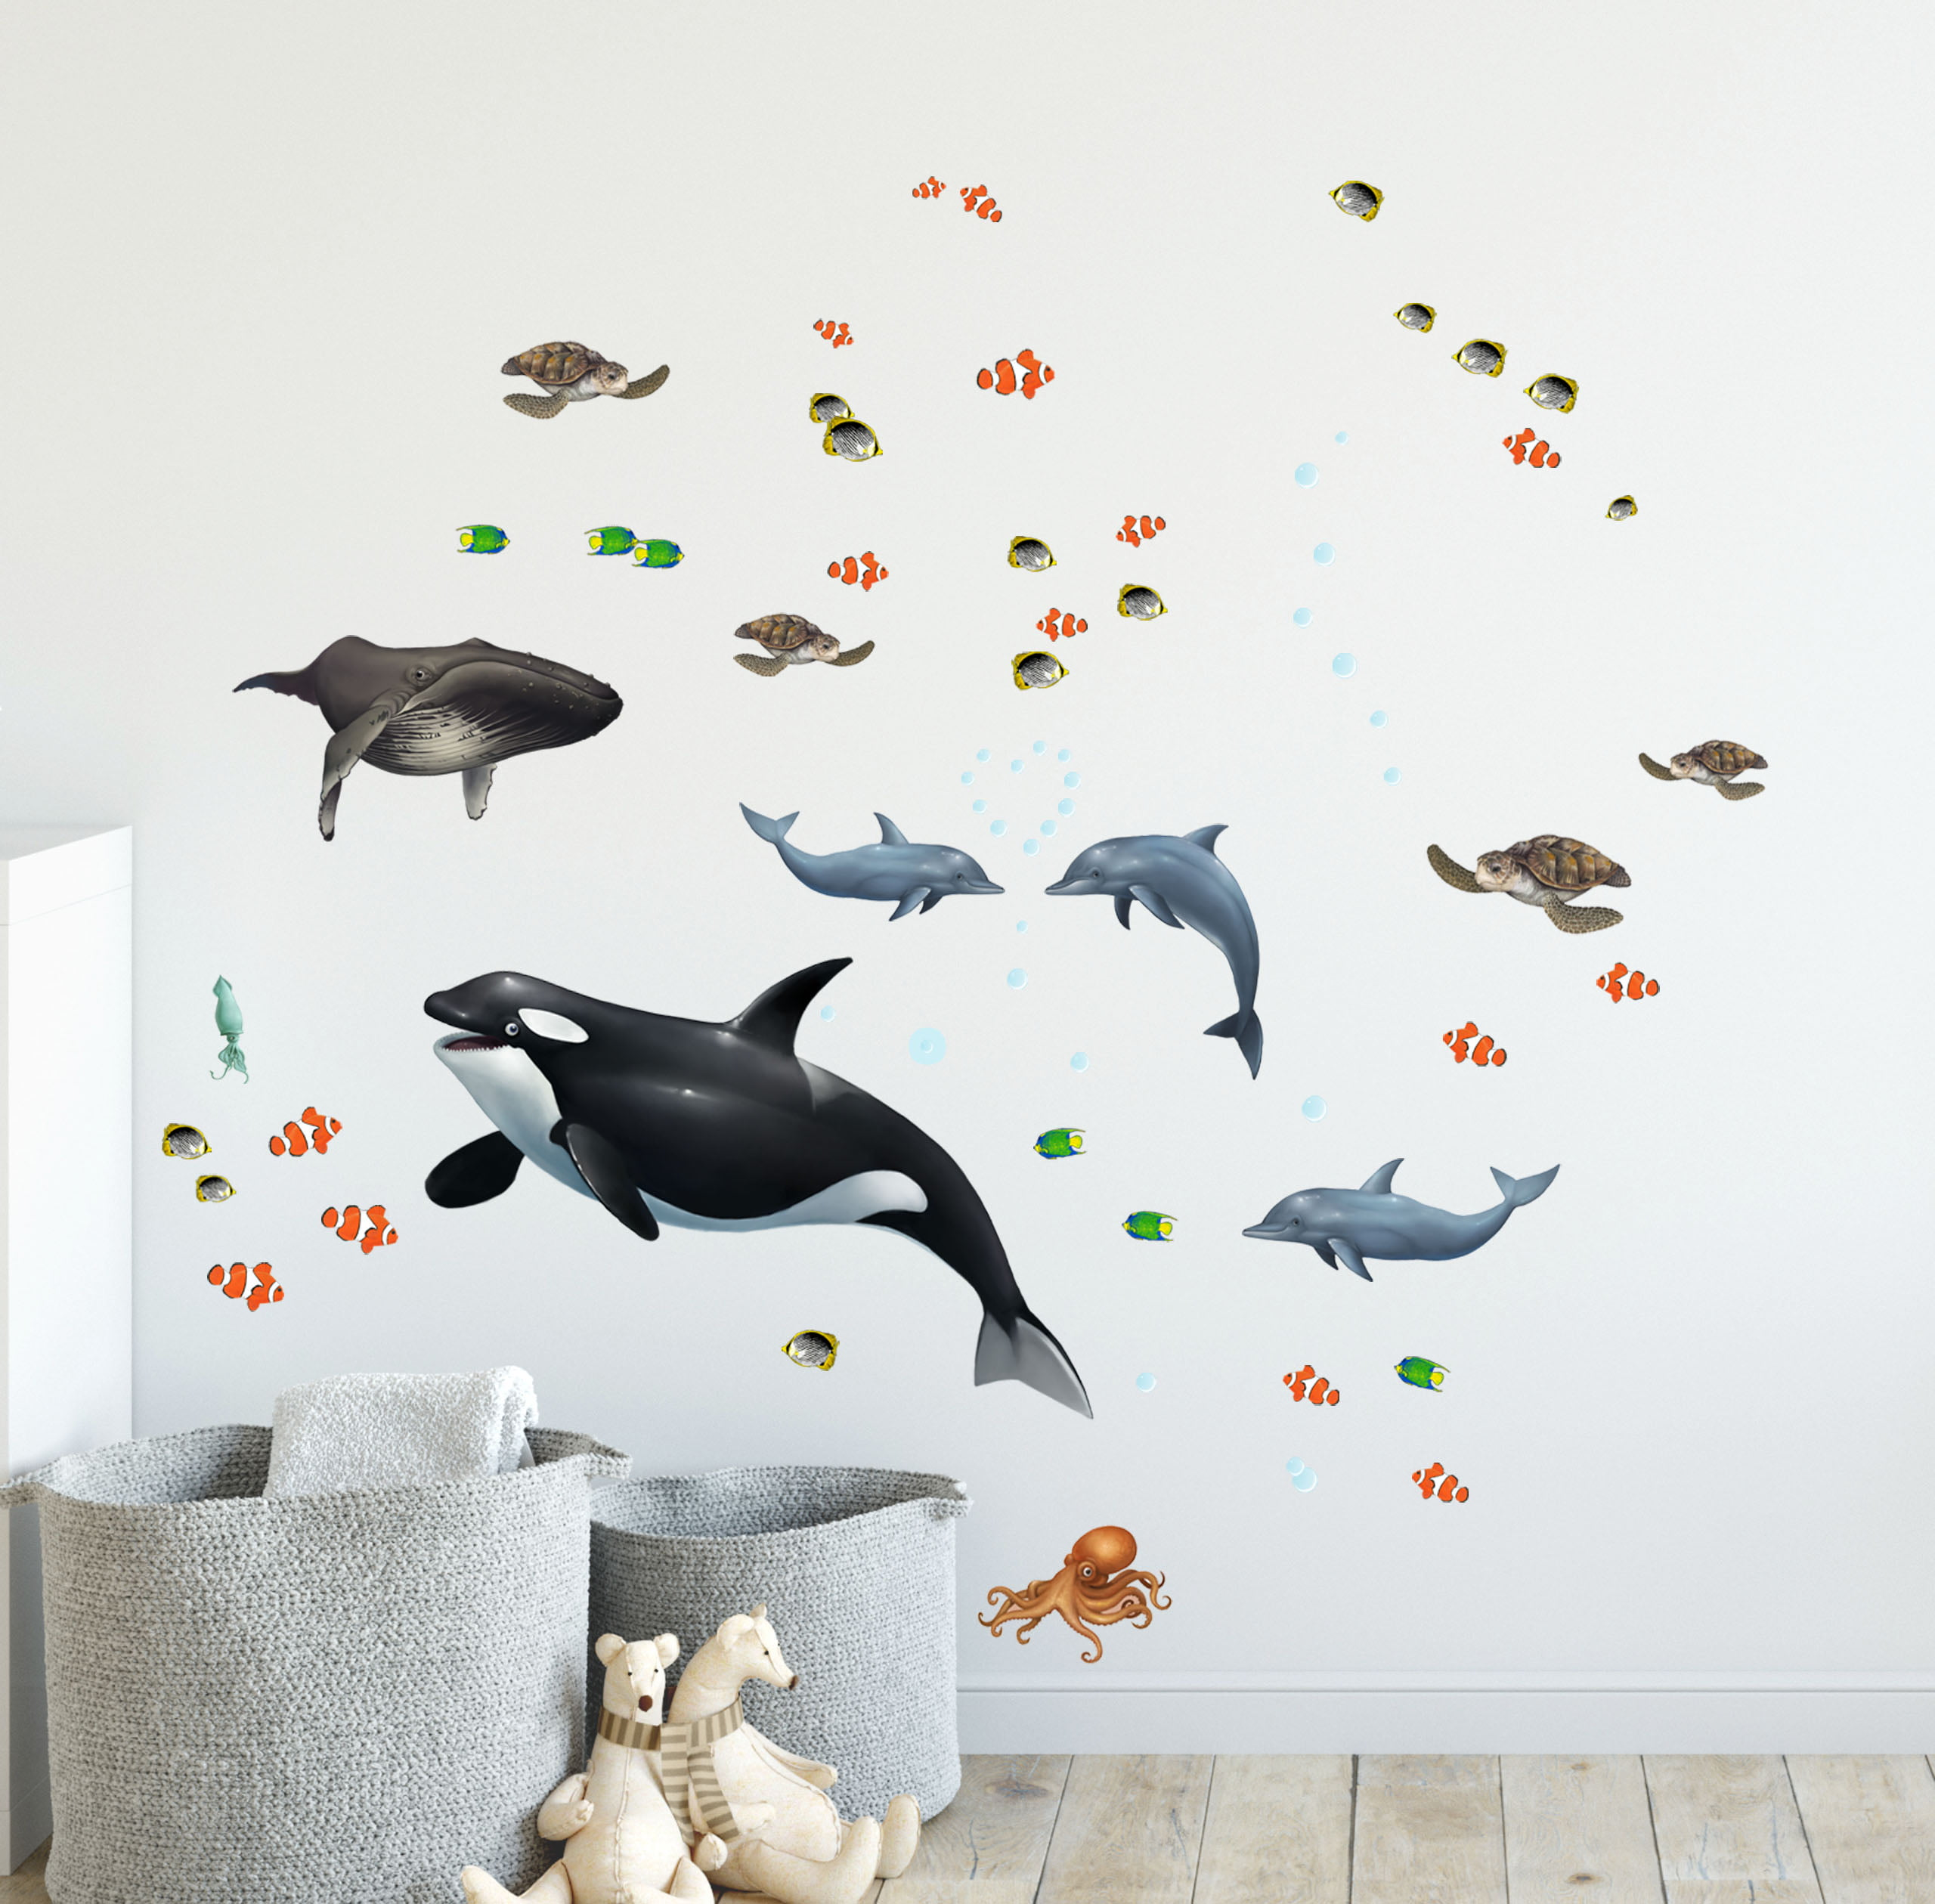 Ocean Wall Decals Under The Sea Fish Whales Dolphins 29 Sea Life Wall Stickers 5 22 Walmart Com Walmart Com